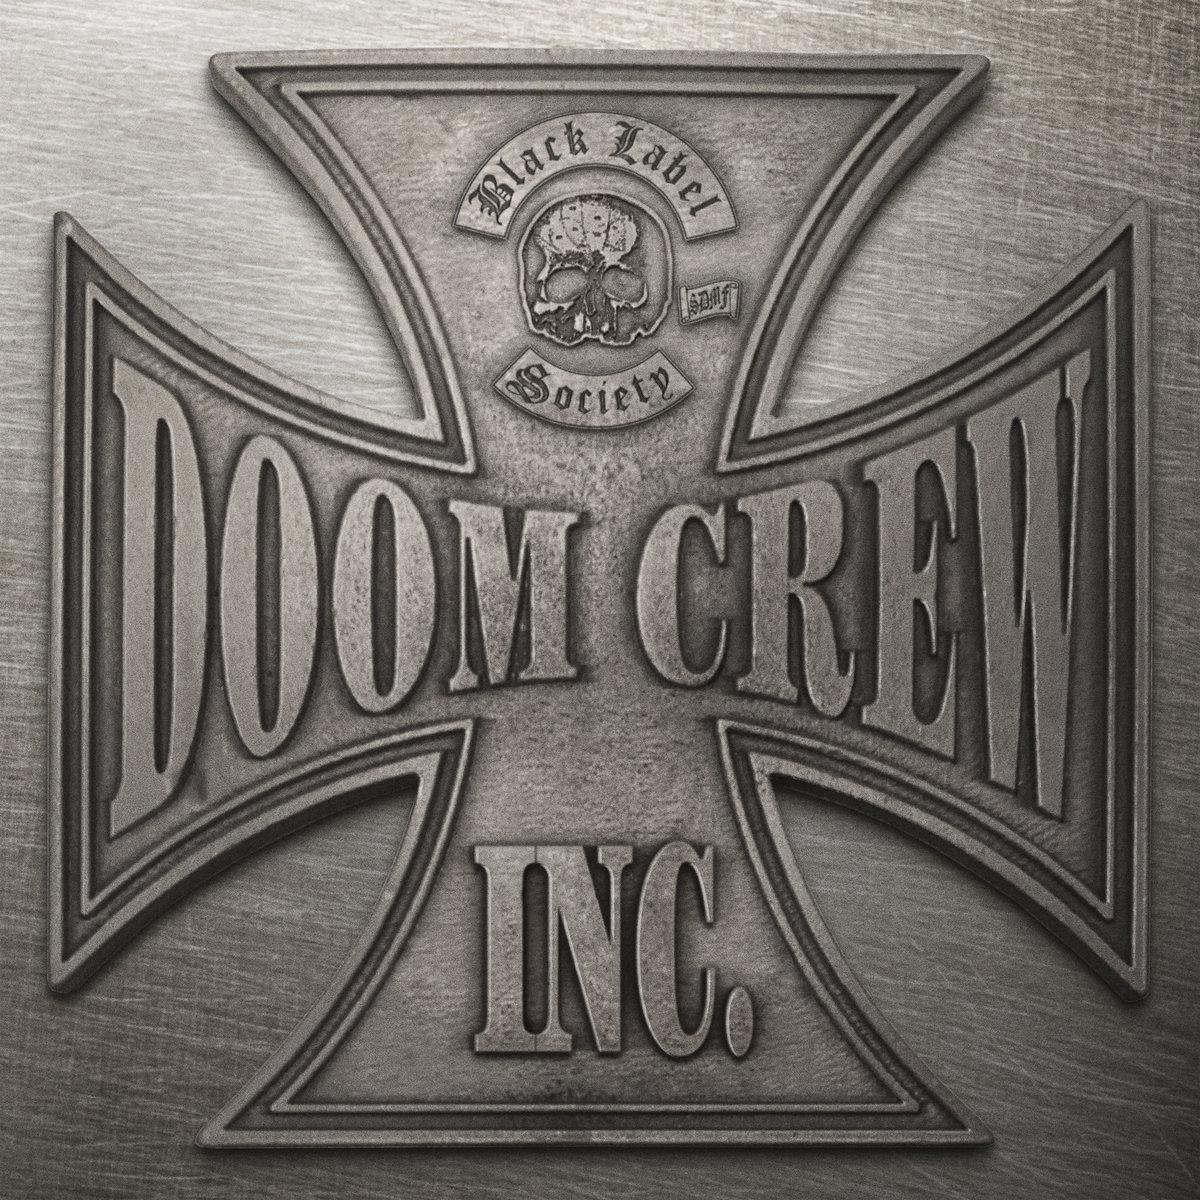 black label society doom crew inc.